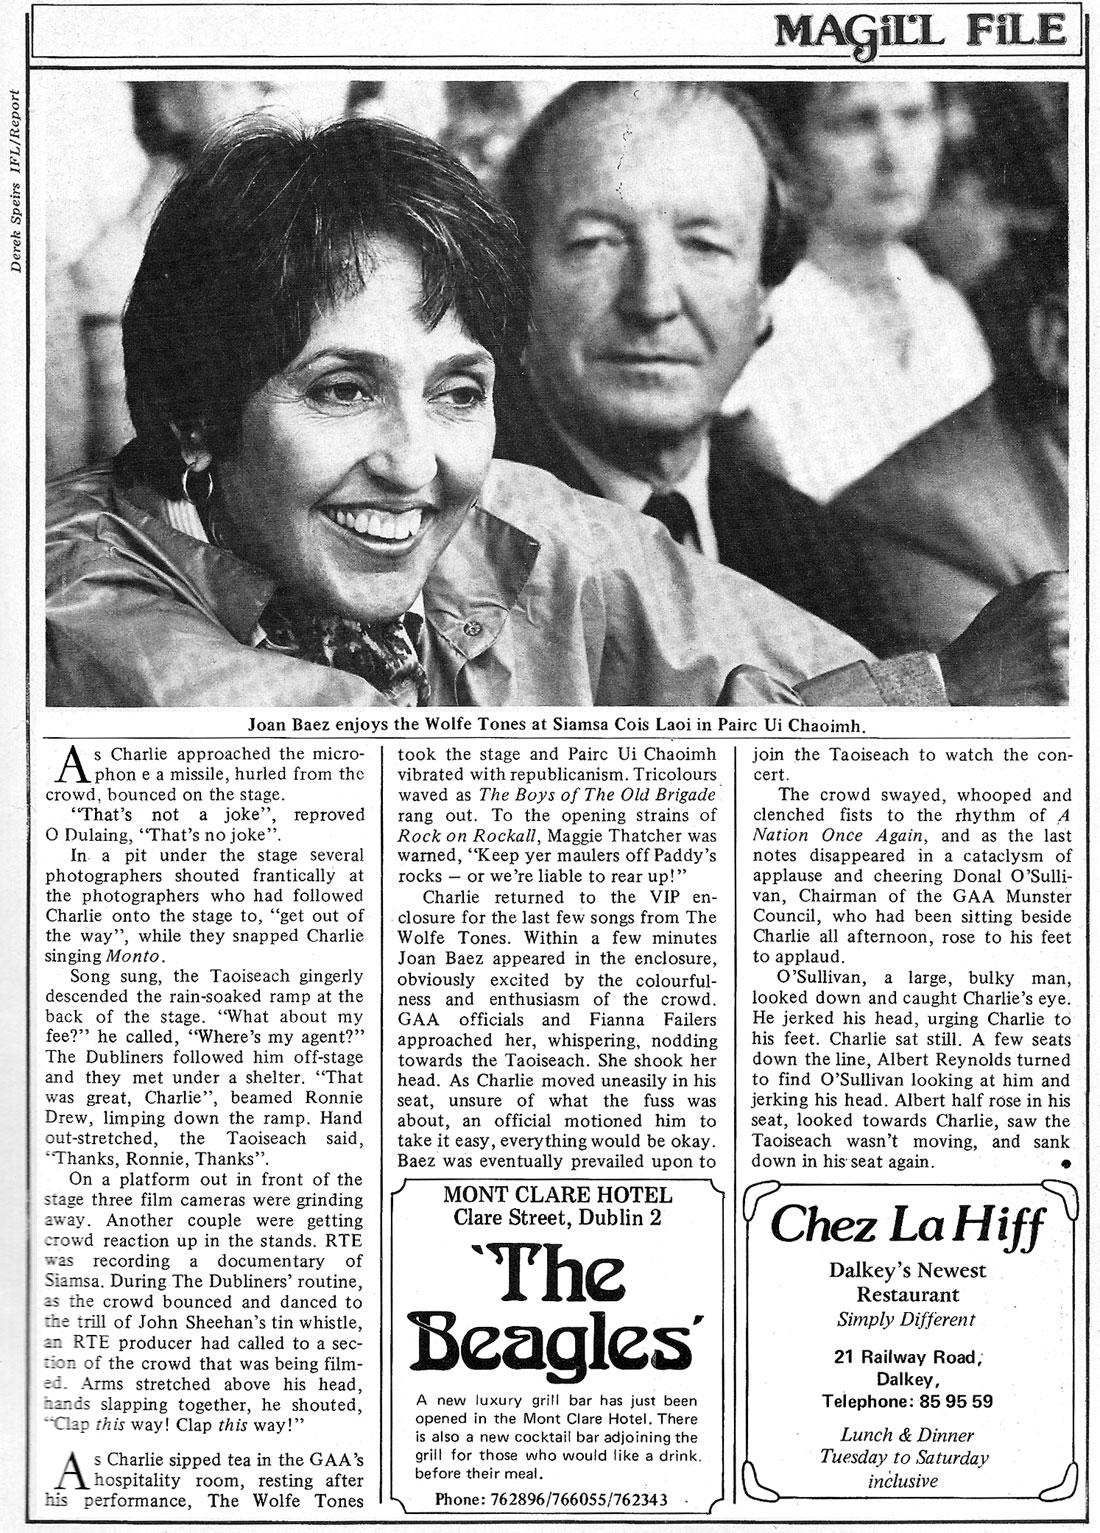 joan baez charlie haughey cork 1980